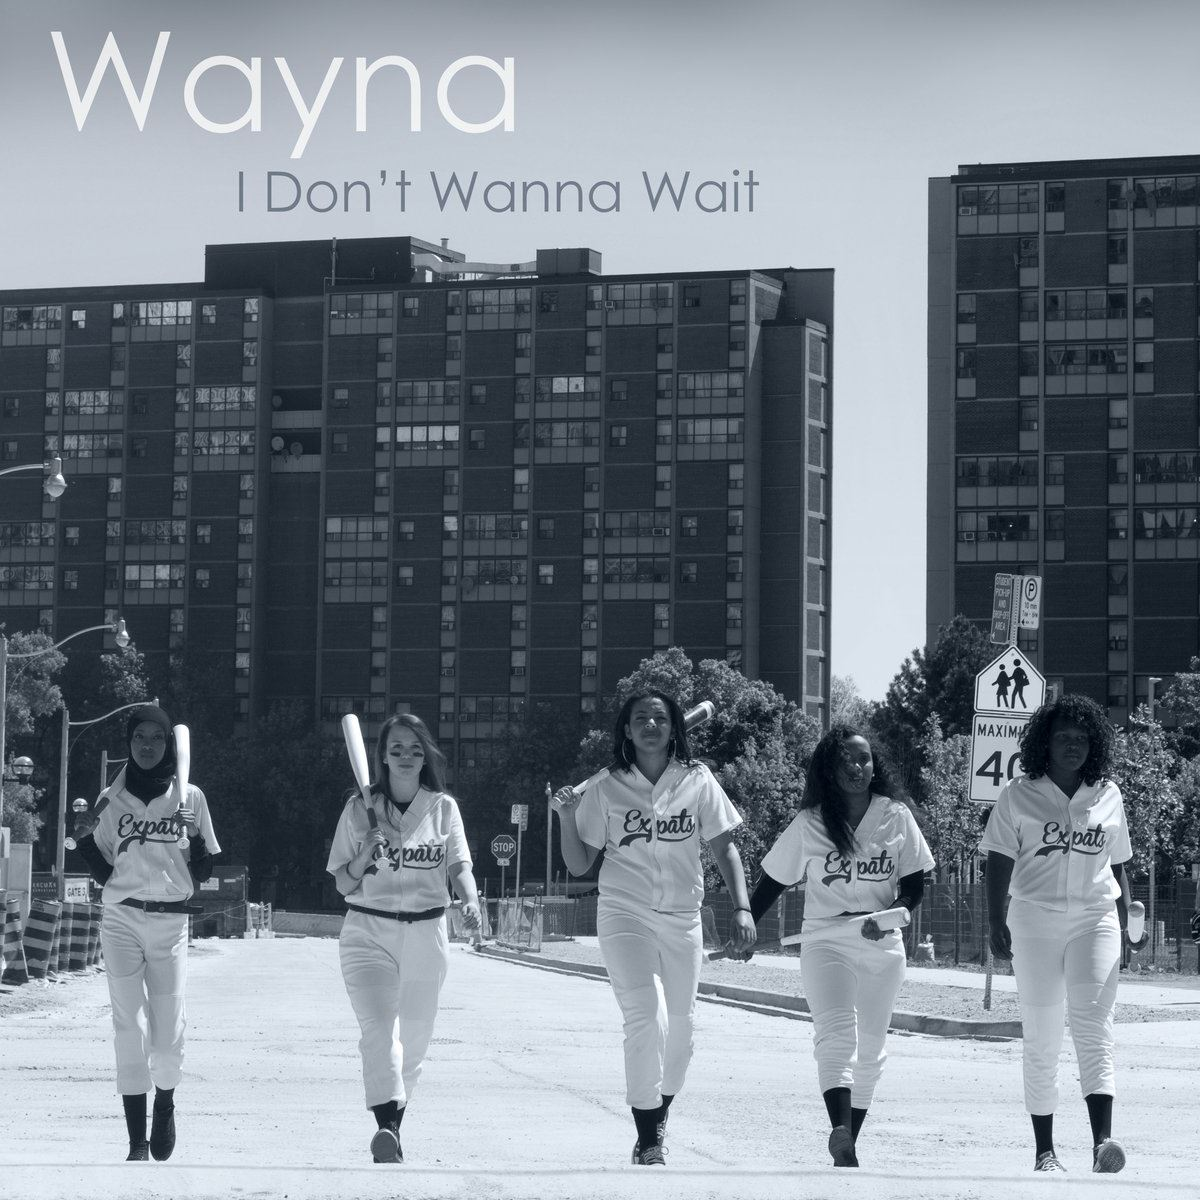 wayna-i-dont-wanna-wait